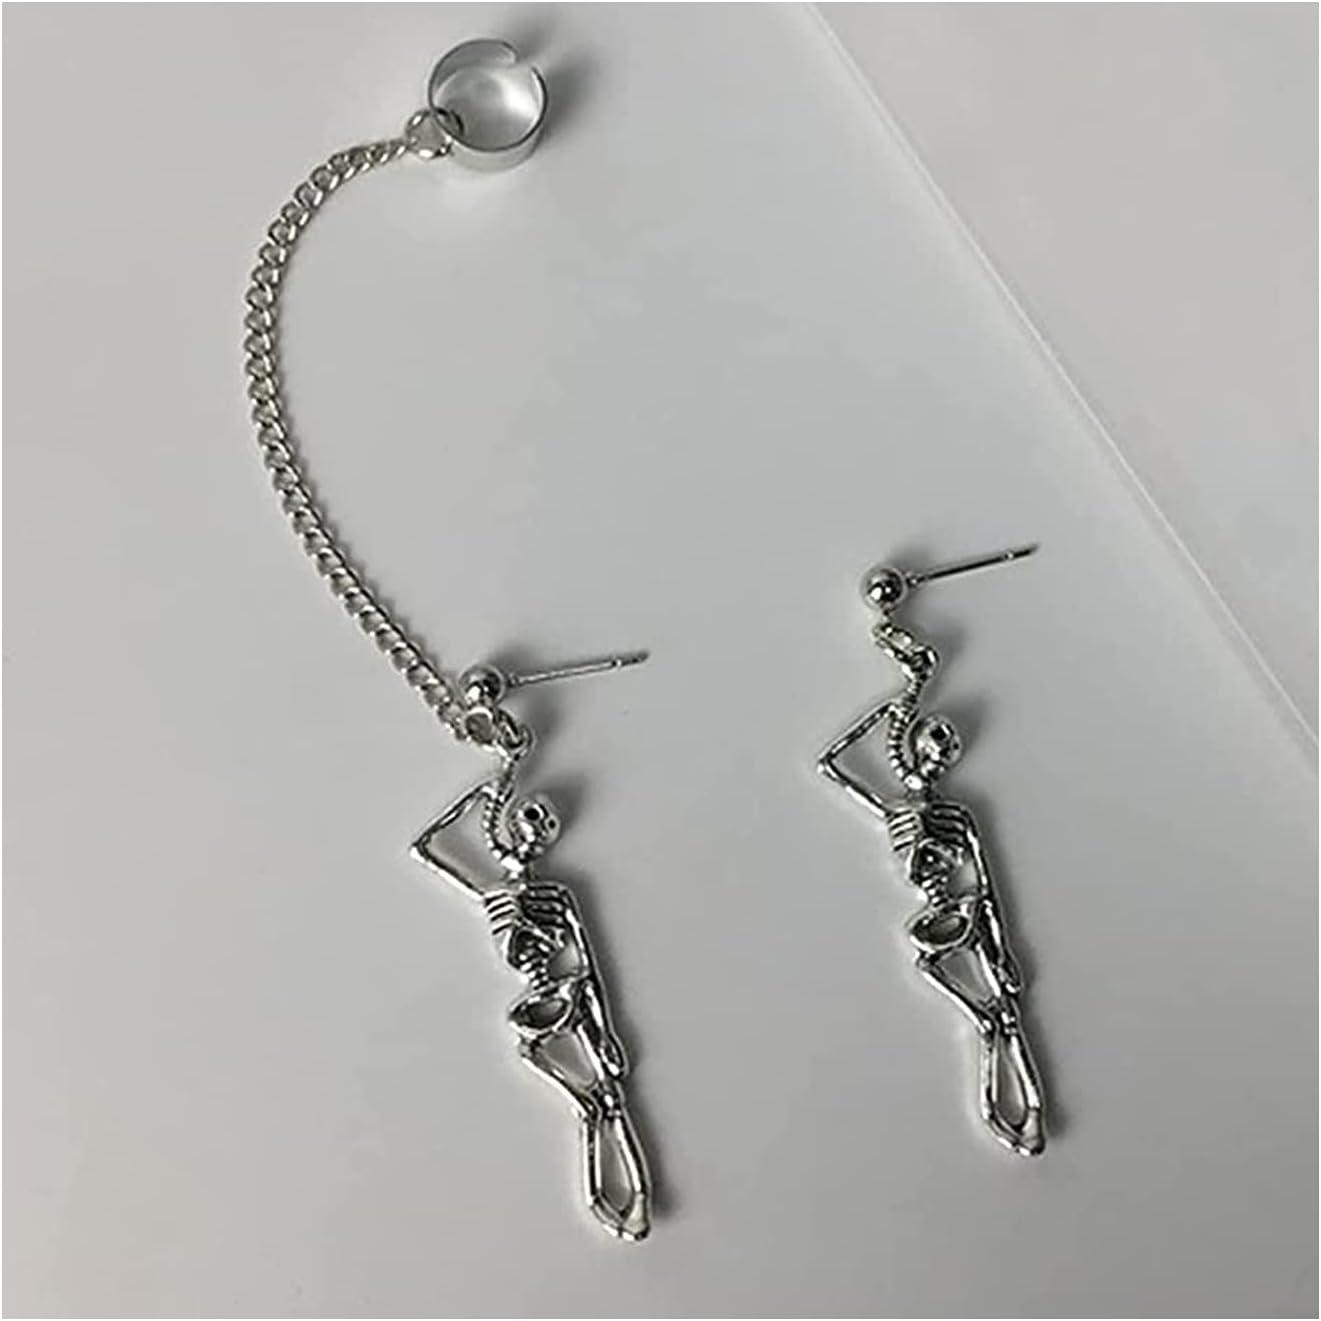 haoxiansheng 2 Pairs Vintage Punk Skull Skeleton Pendant Dangle Earrings,Stainless Steel Gothic Hip Hop Jewelry Skeleton Dangle Earrings,Jewelry for Halloween Party (2 Pairs Ear Stud)